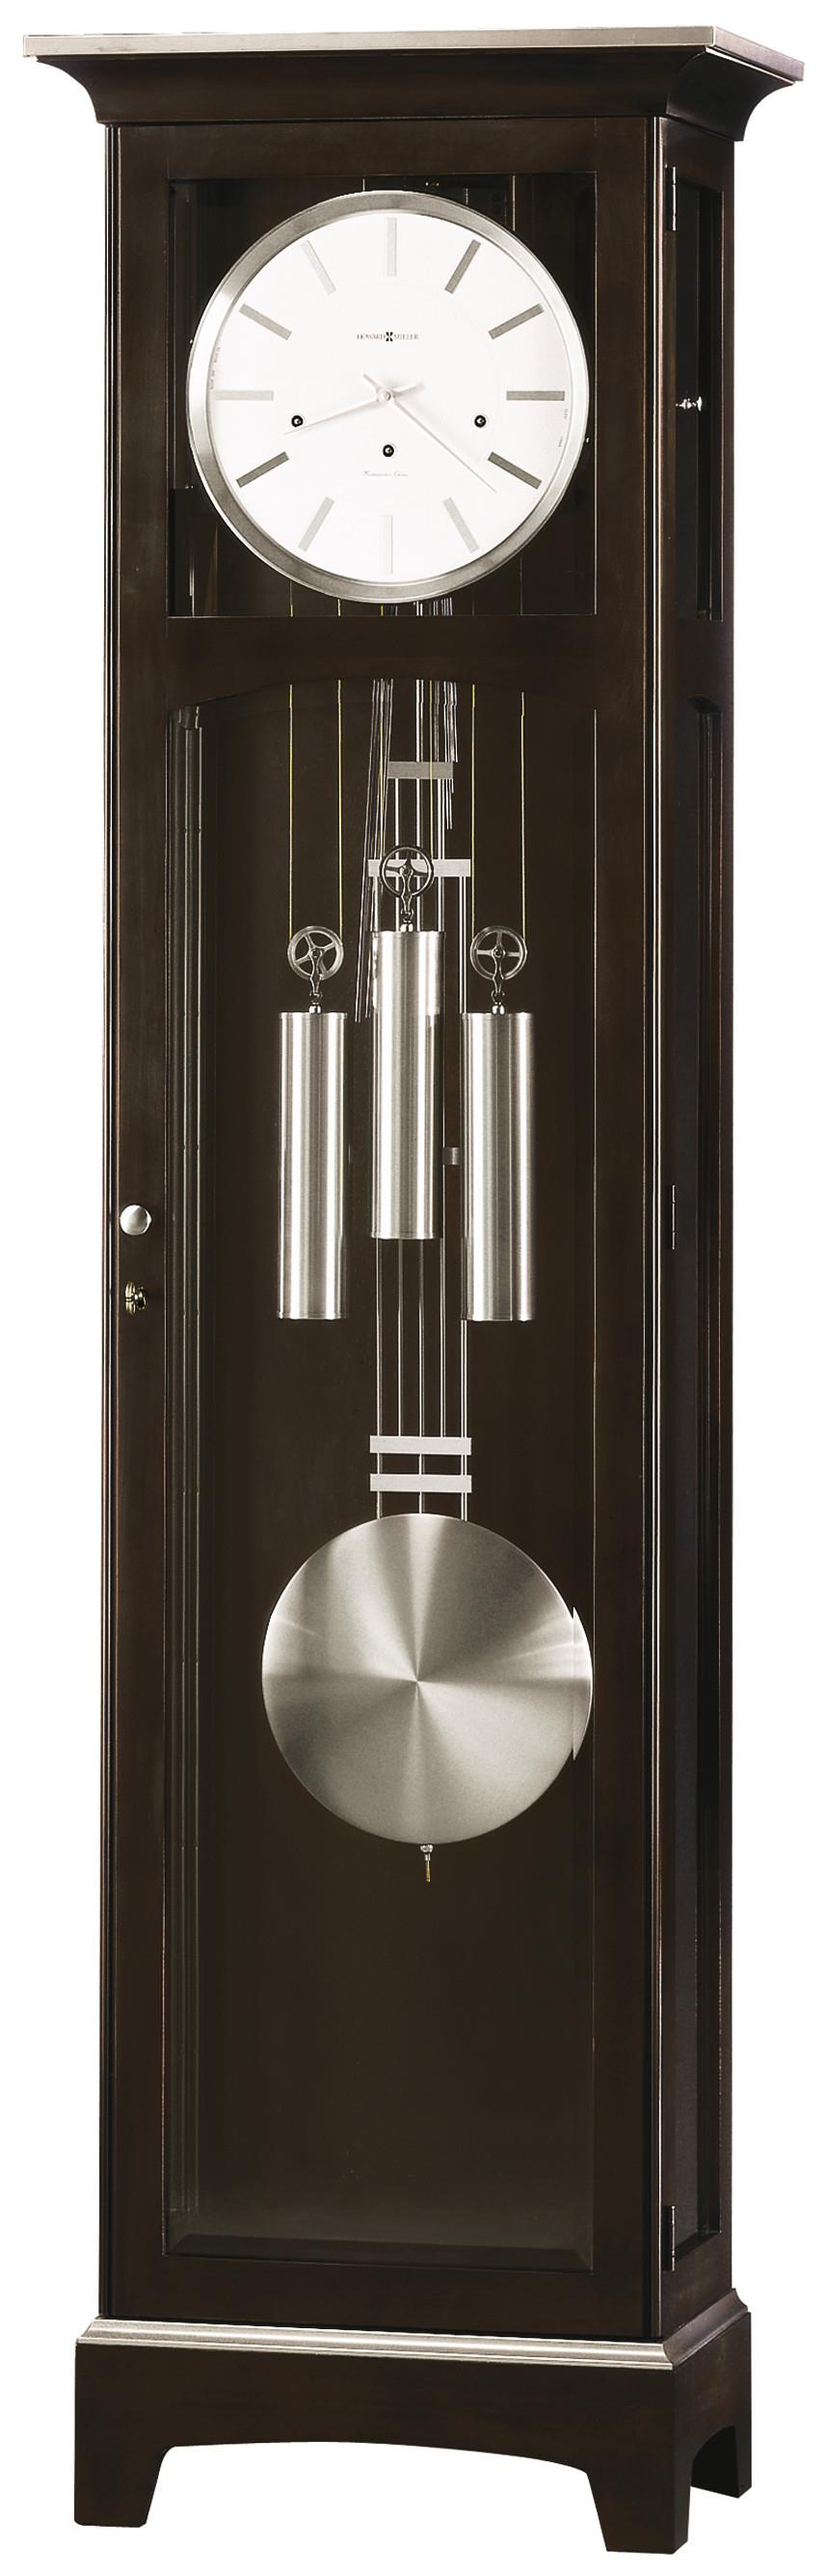 Urban II Floor Clock by Howard Miller at HomeWorld Furniture